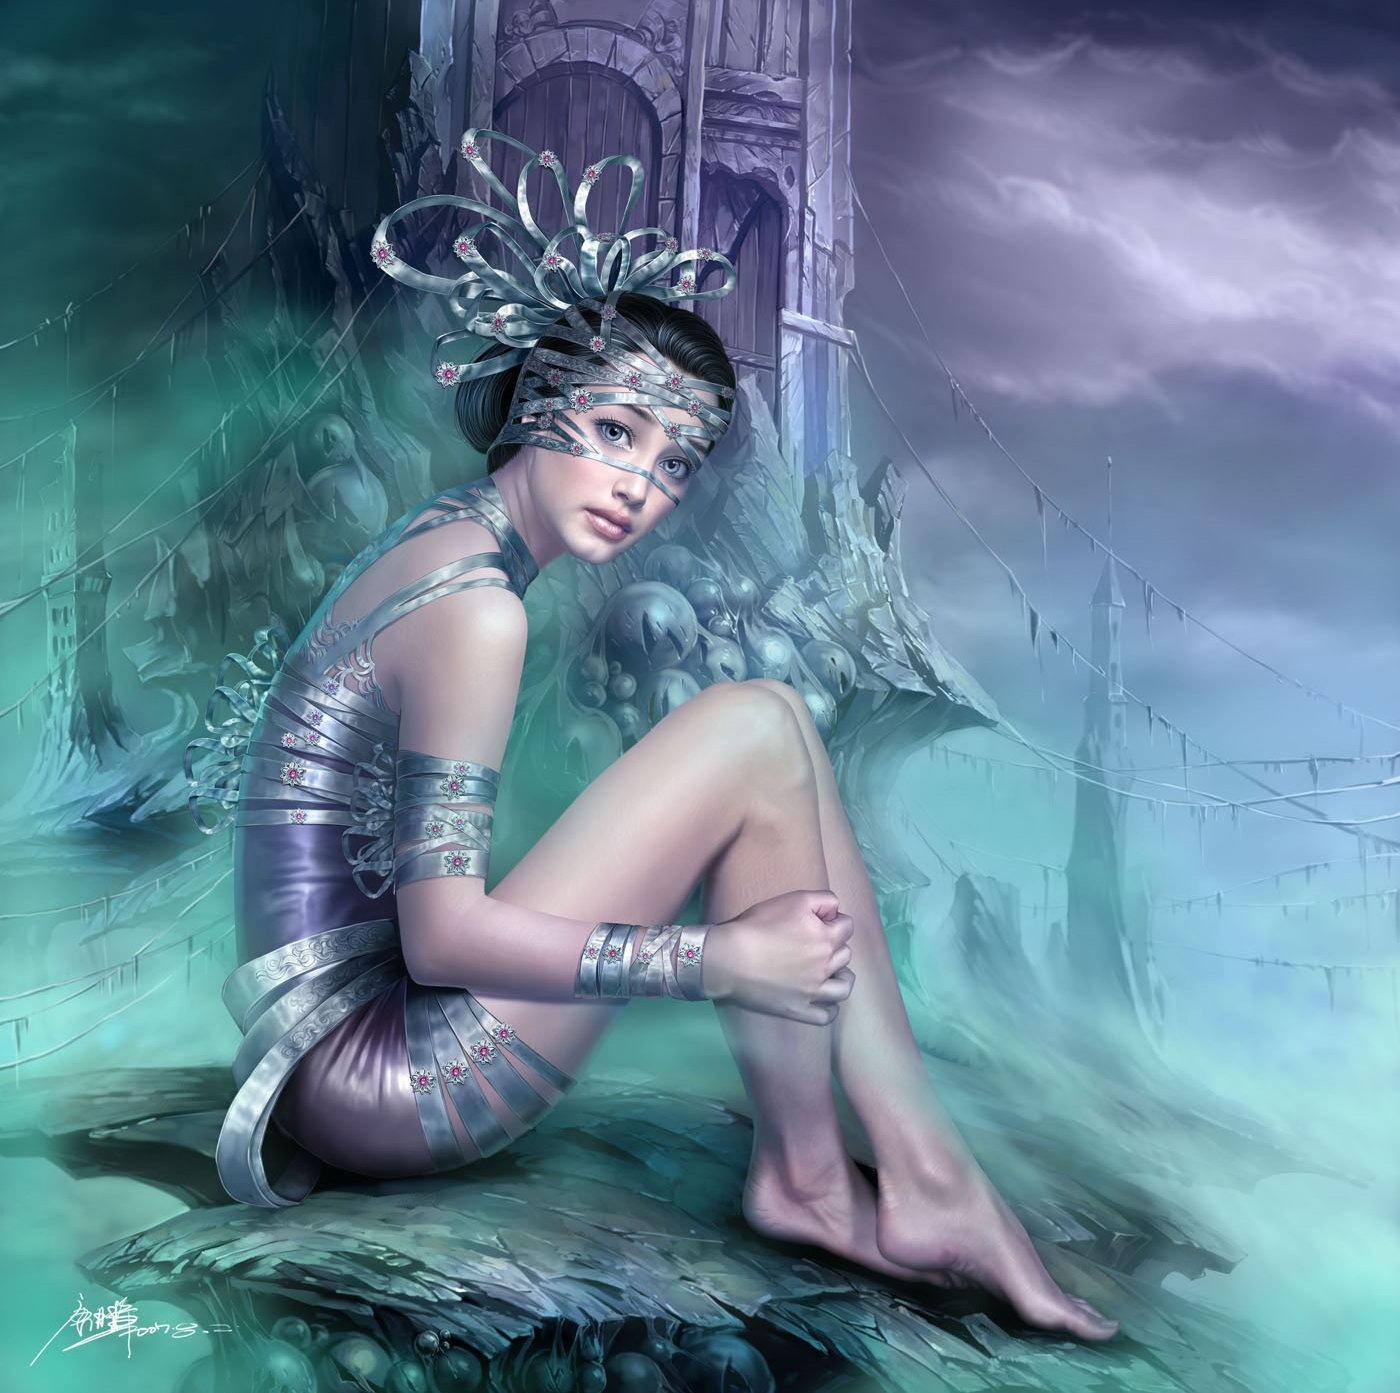 Digital Art: 80+ Most Beautiful CG Girls On The Web (Part